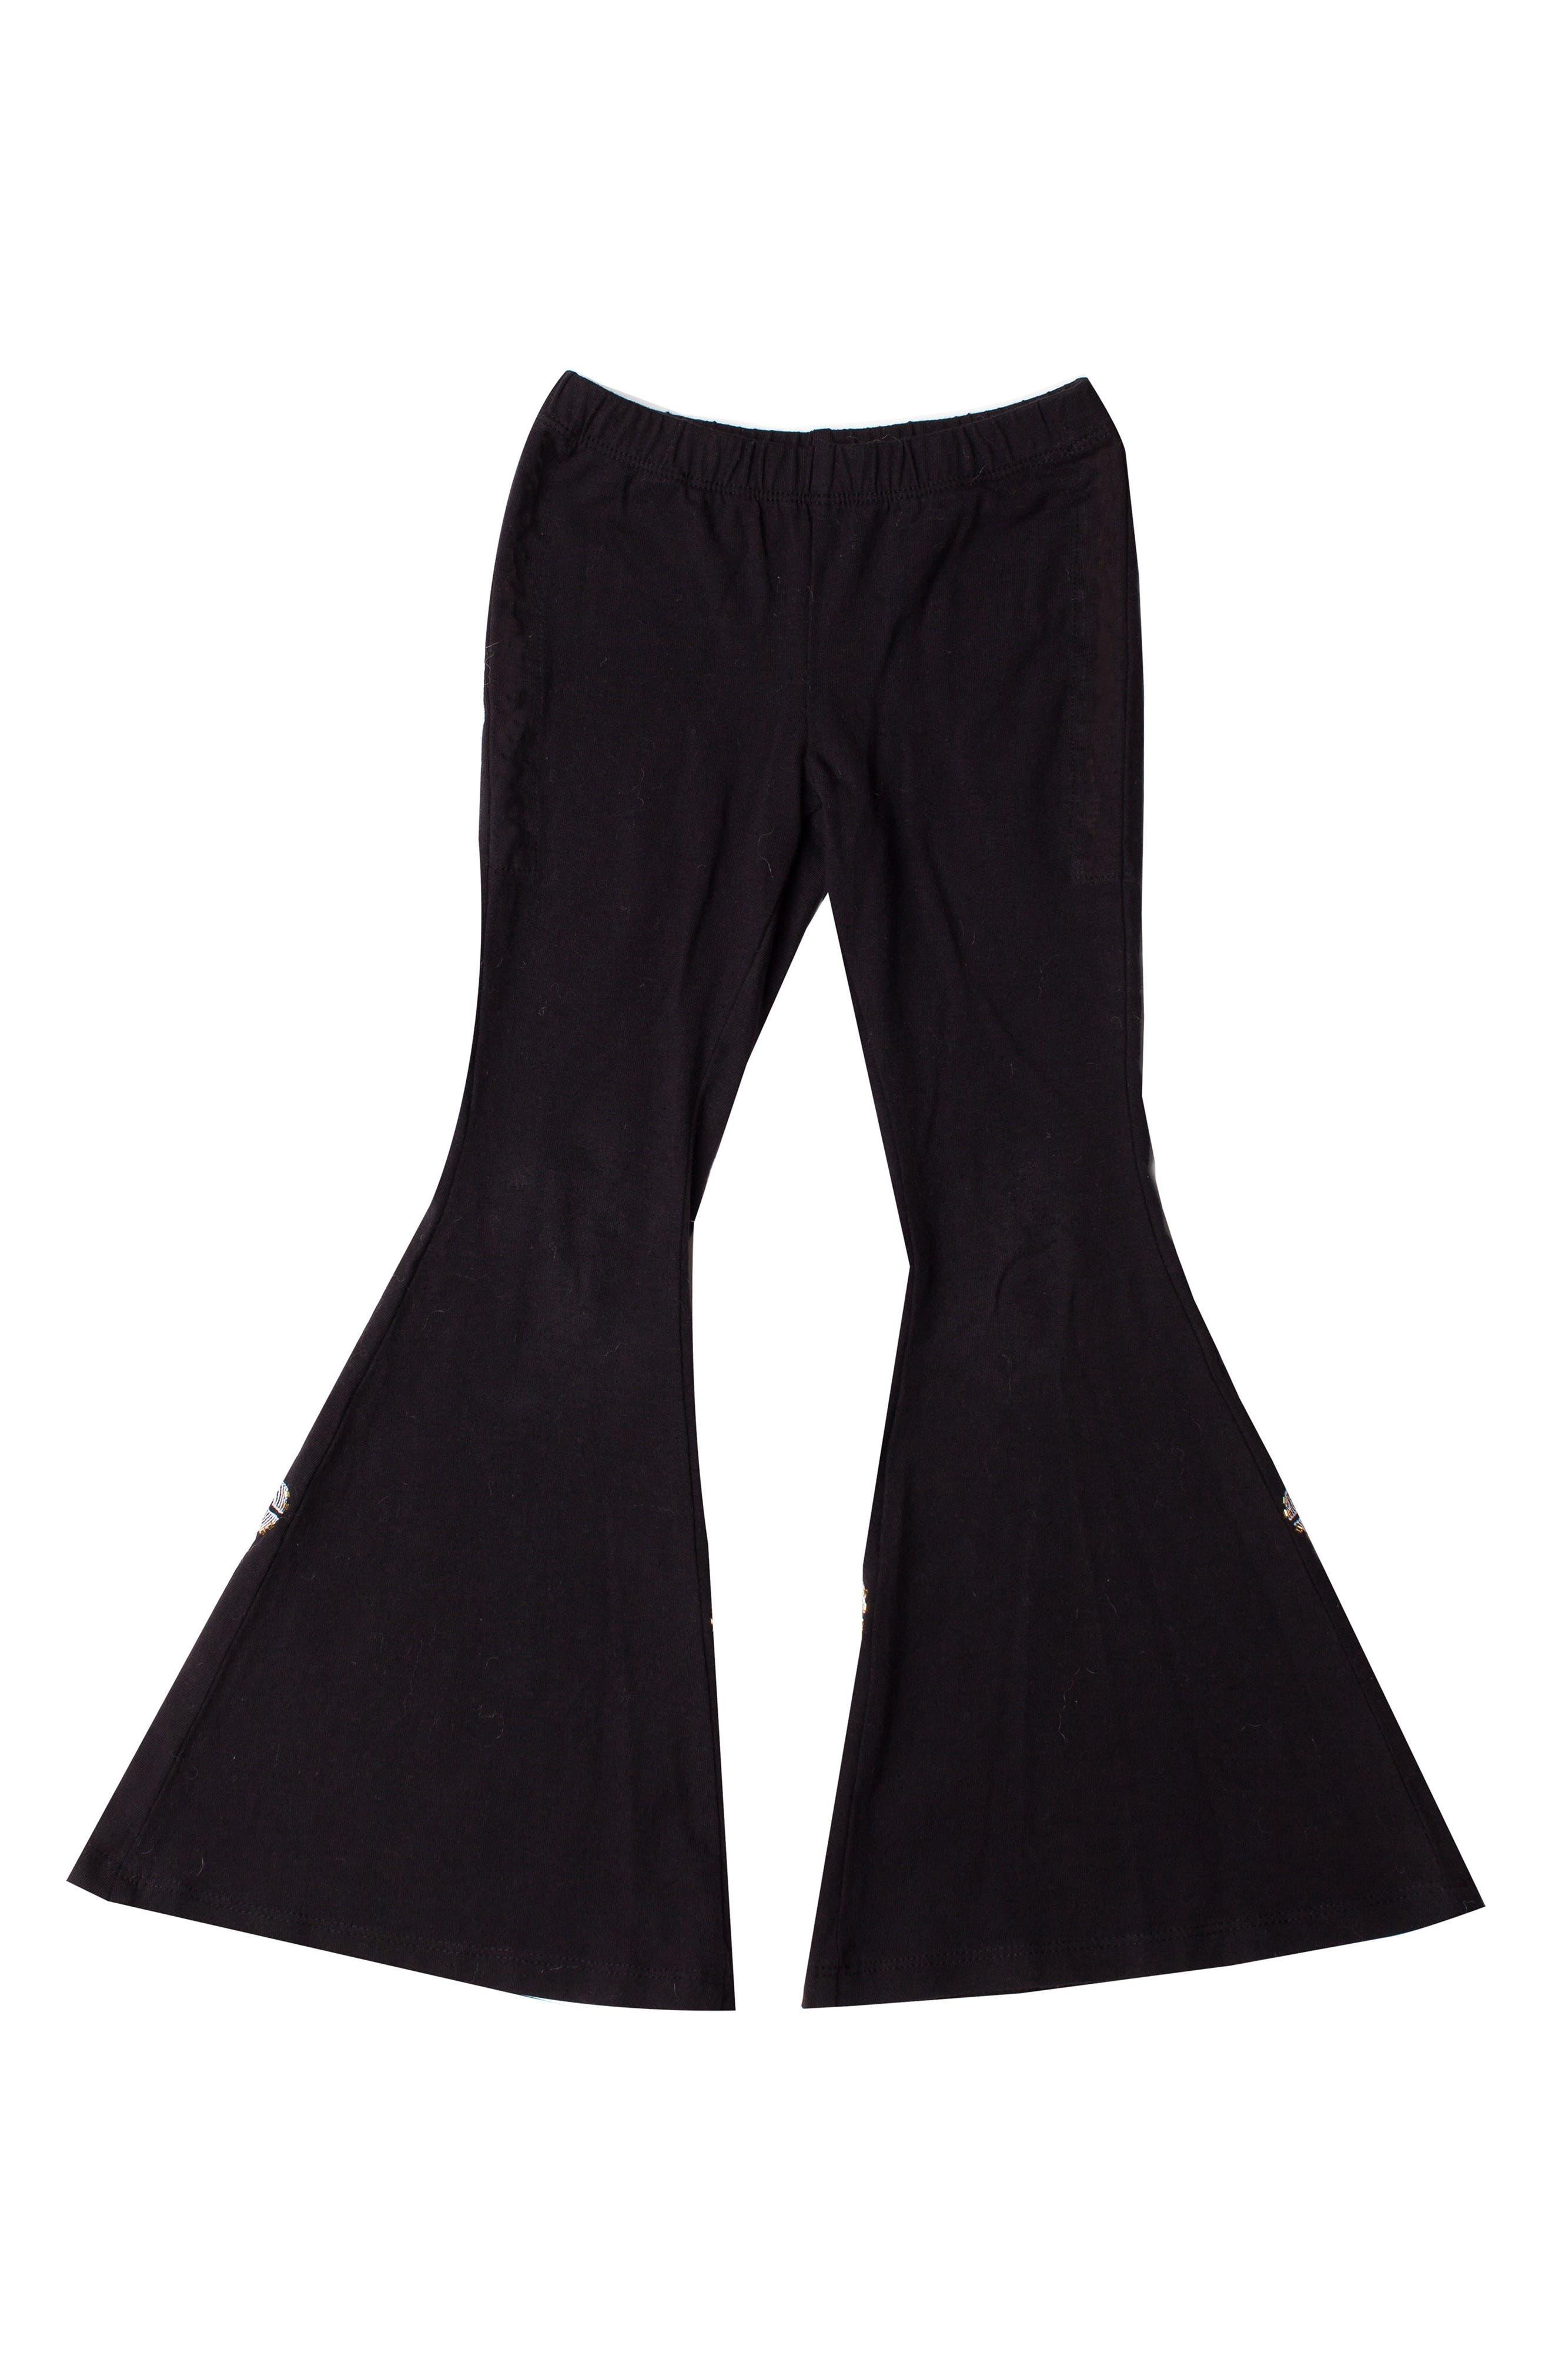 Flare Leg Pants,                             Main thumbnail 1, color,                             Black